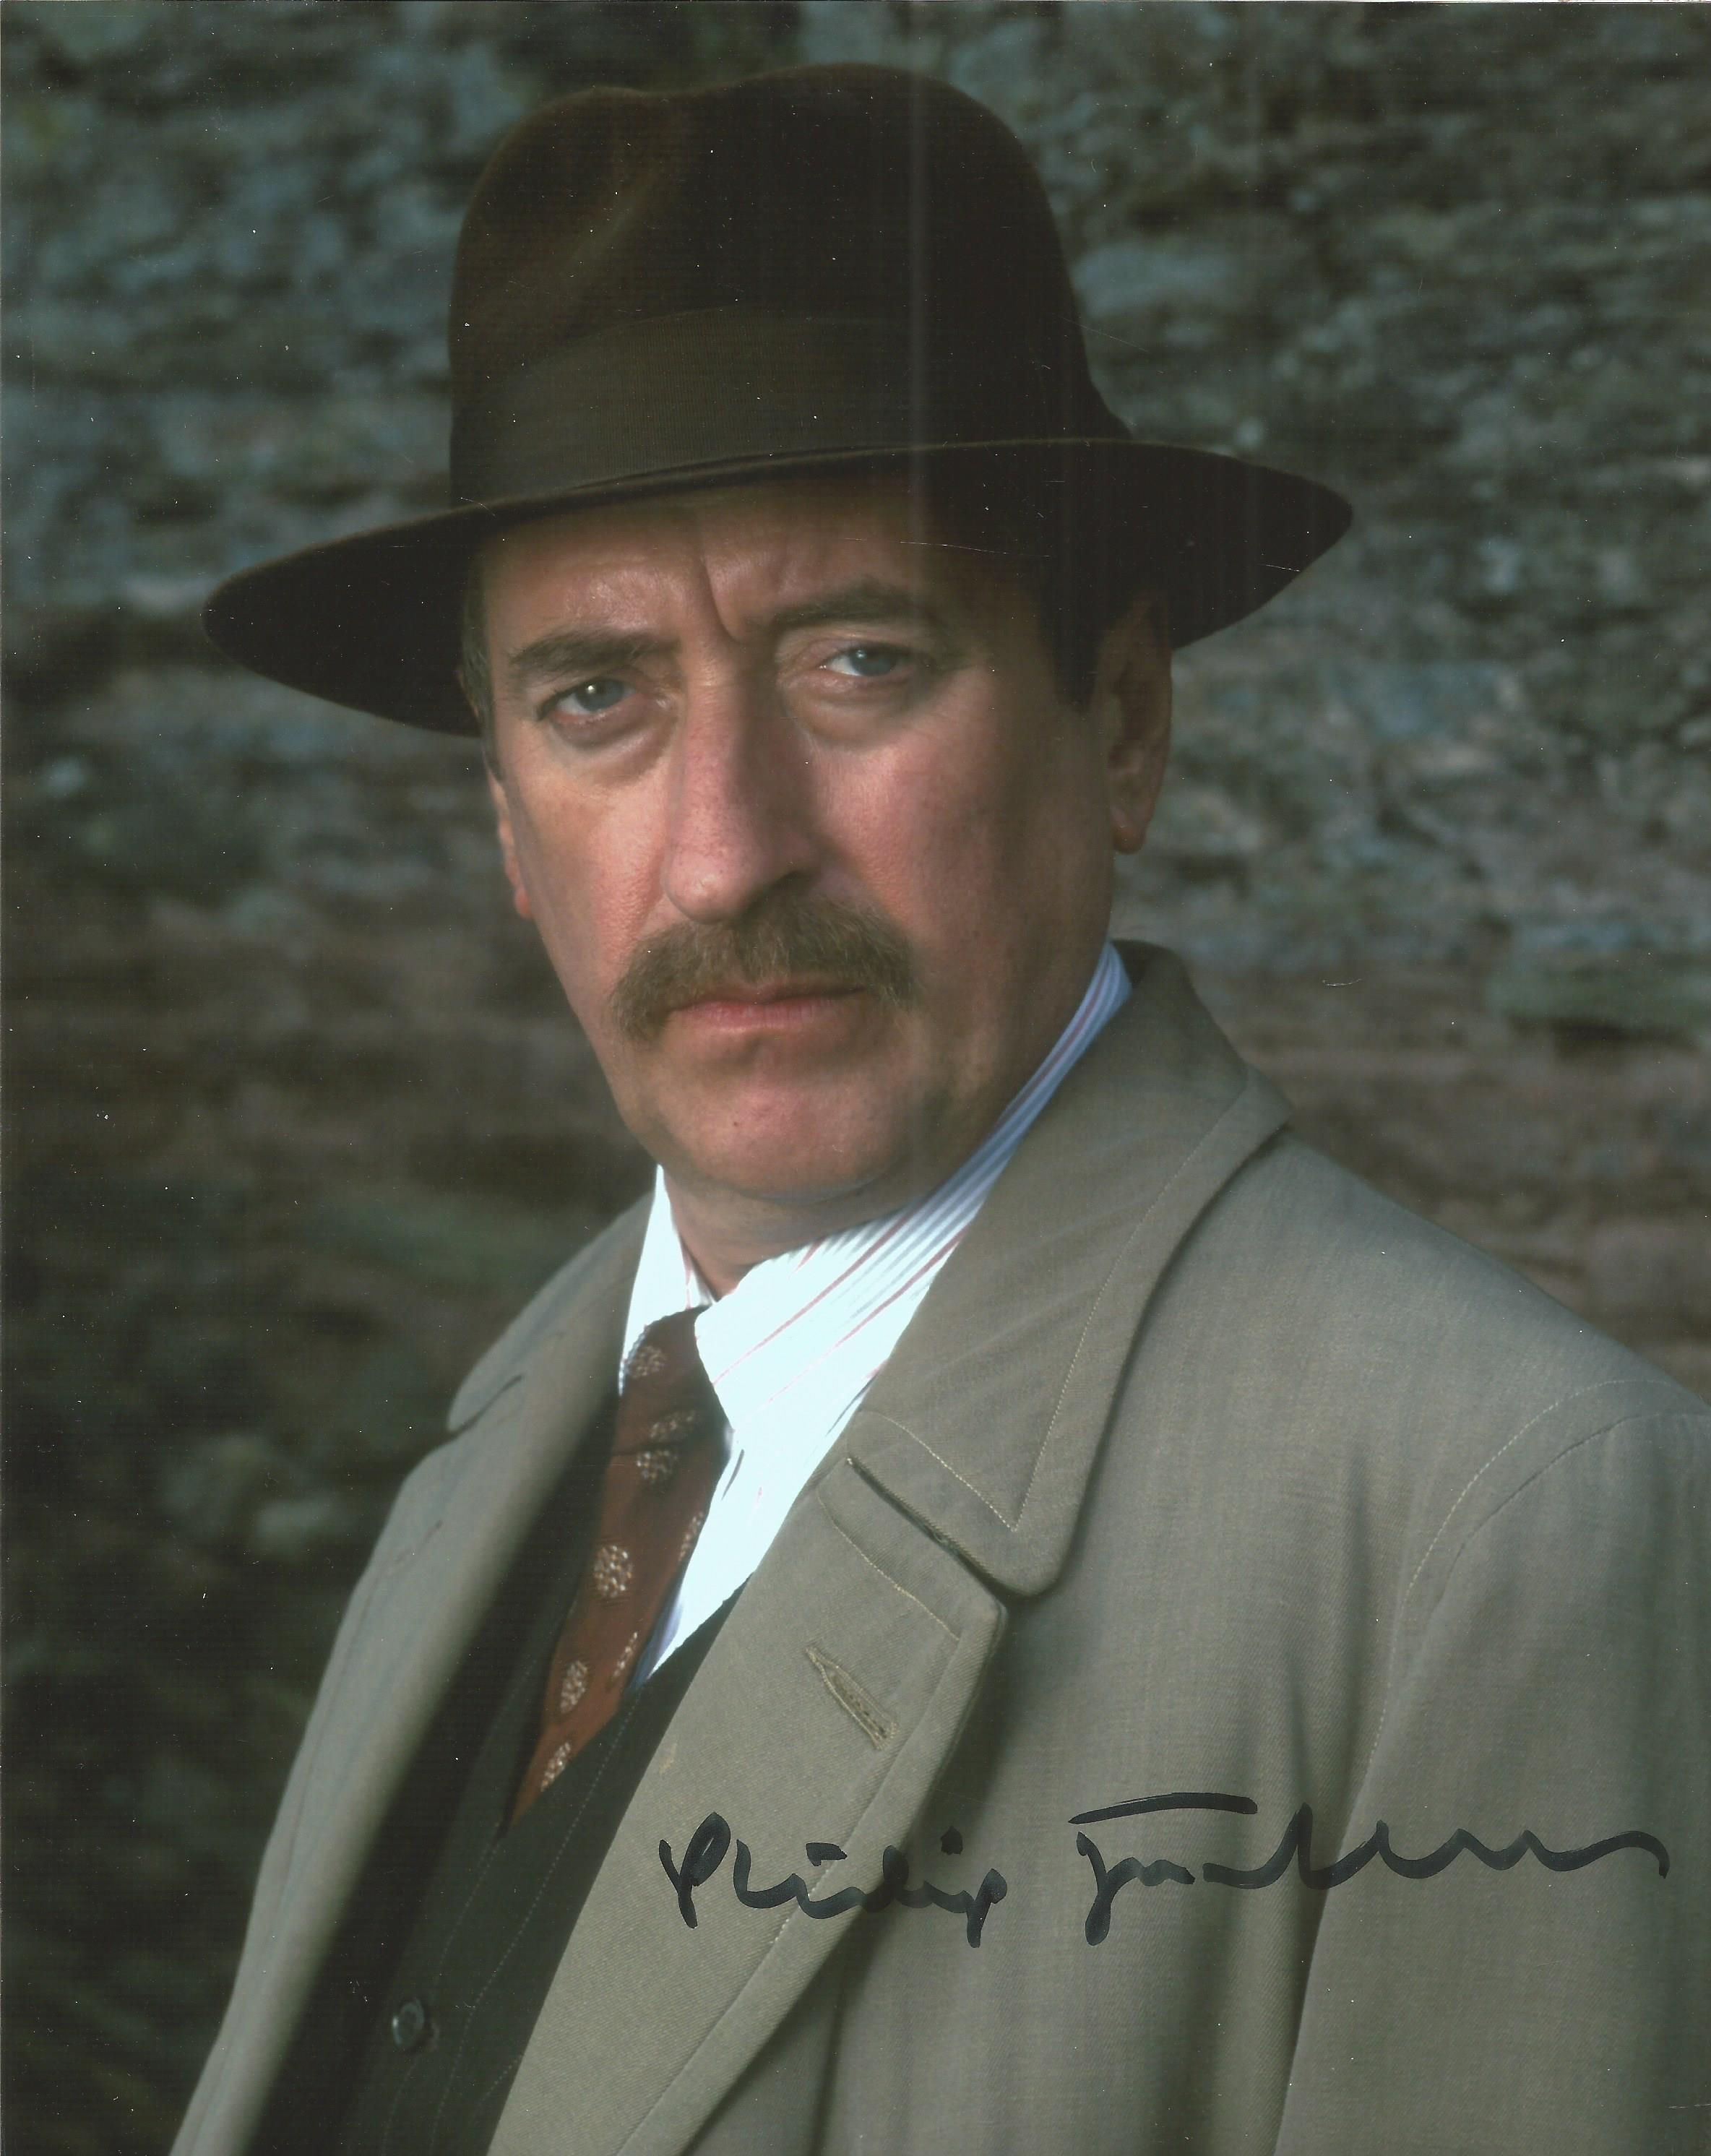 Poirot Phillip Jackson signed 10x8 colour photo. Good condition. All autographs come with a